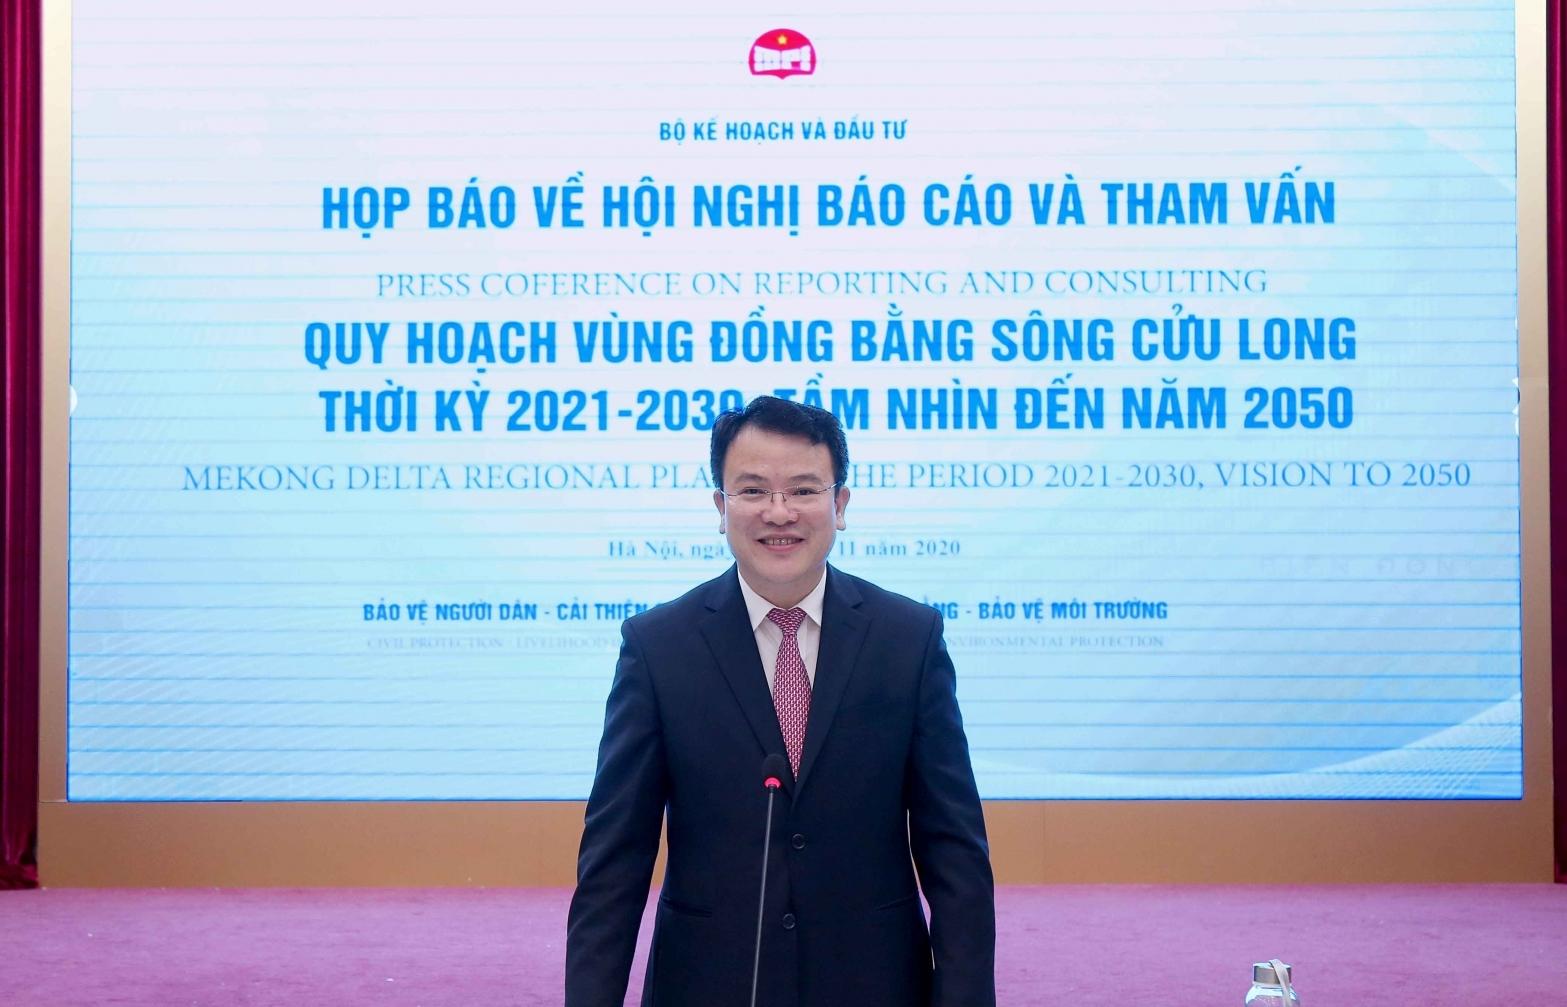 Building Mekong Delta regional plan in 2021-2030, vision to 2050